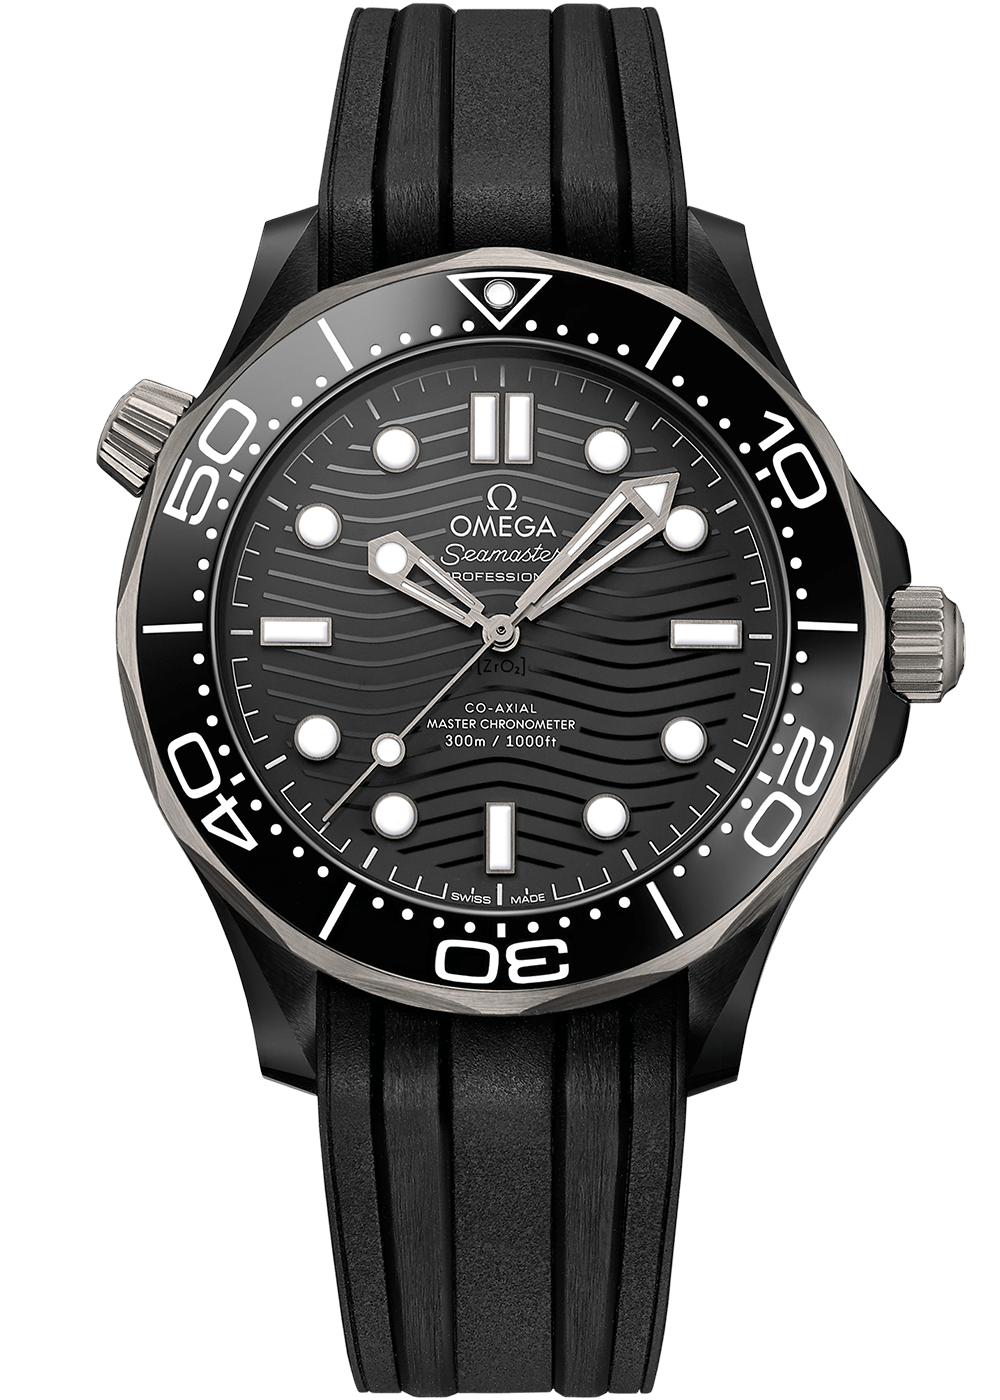 Omega Seamaster Diver 300m Ceramic